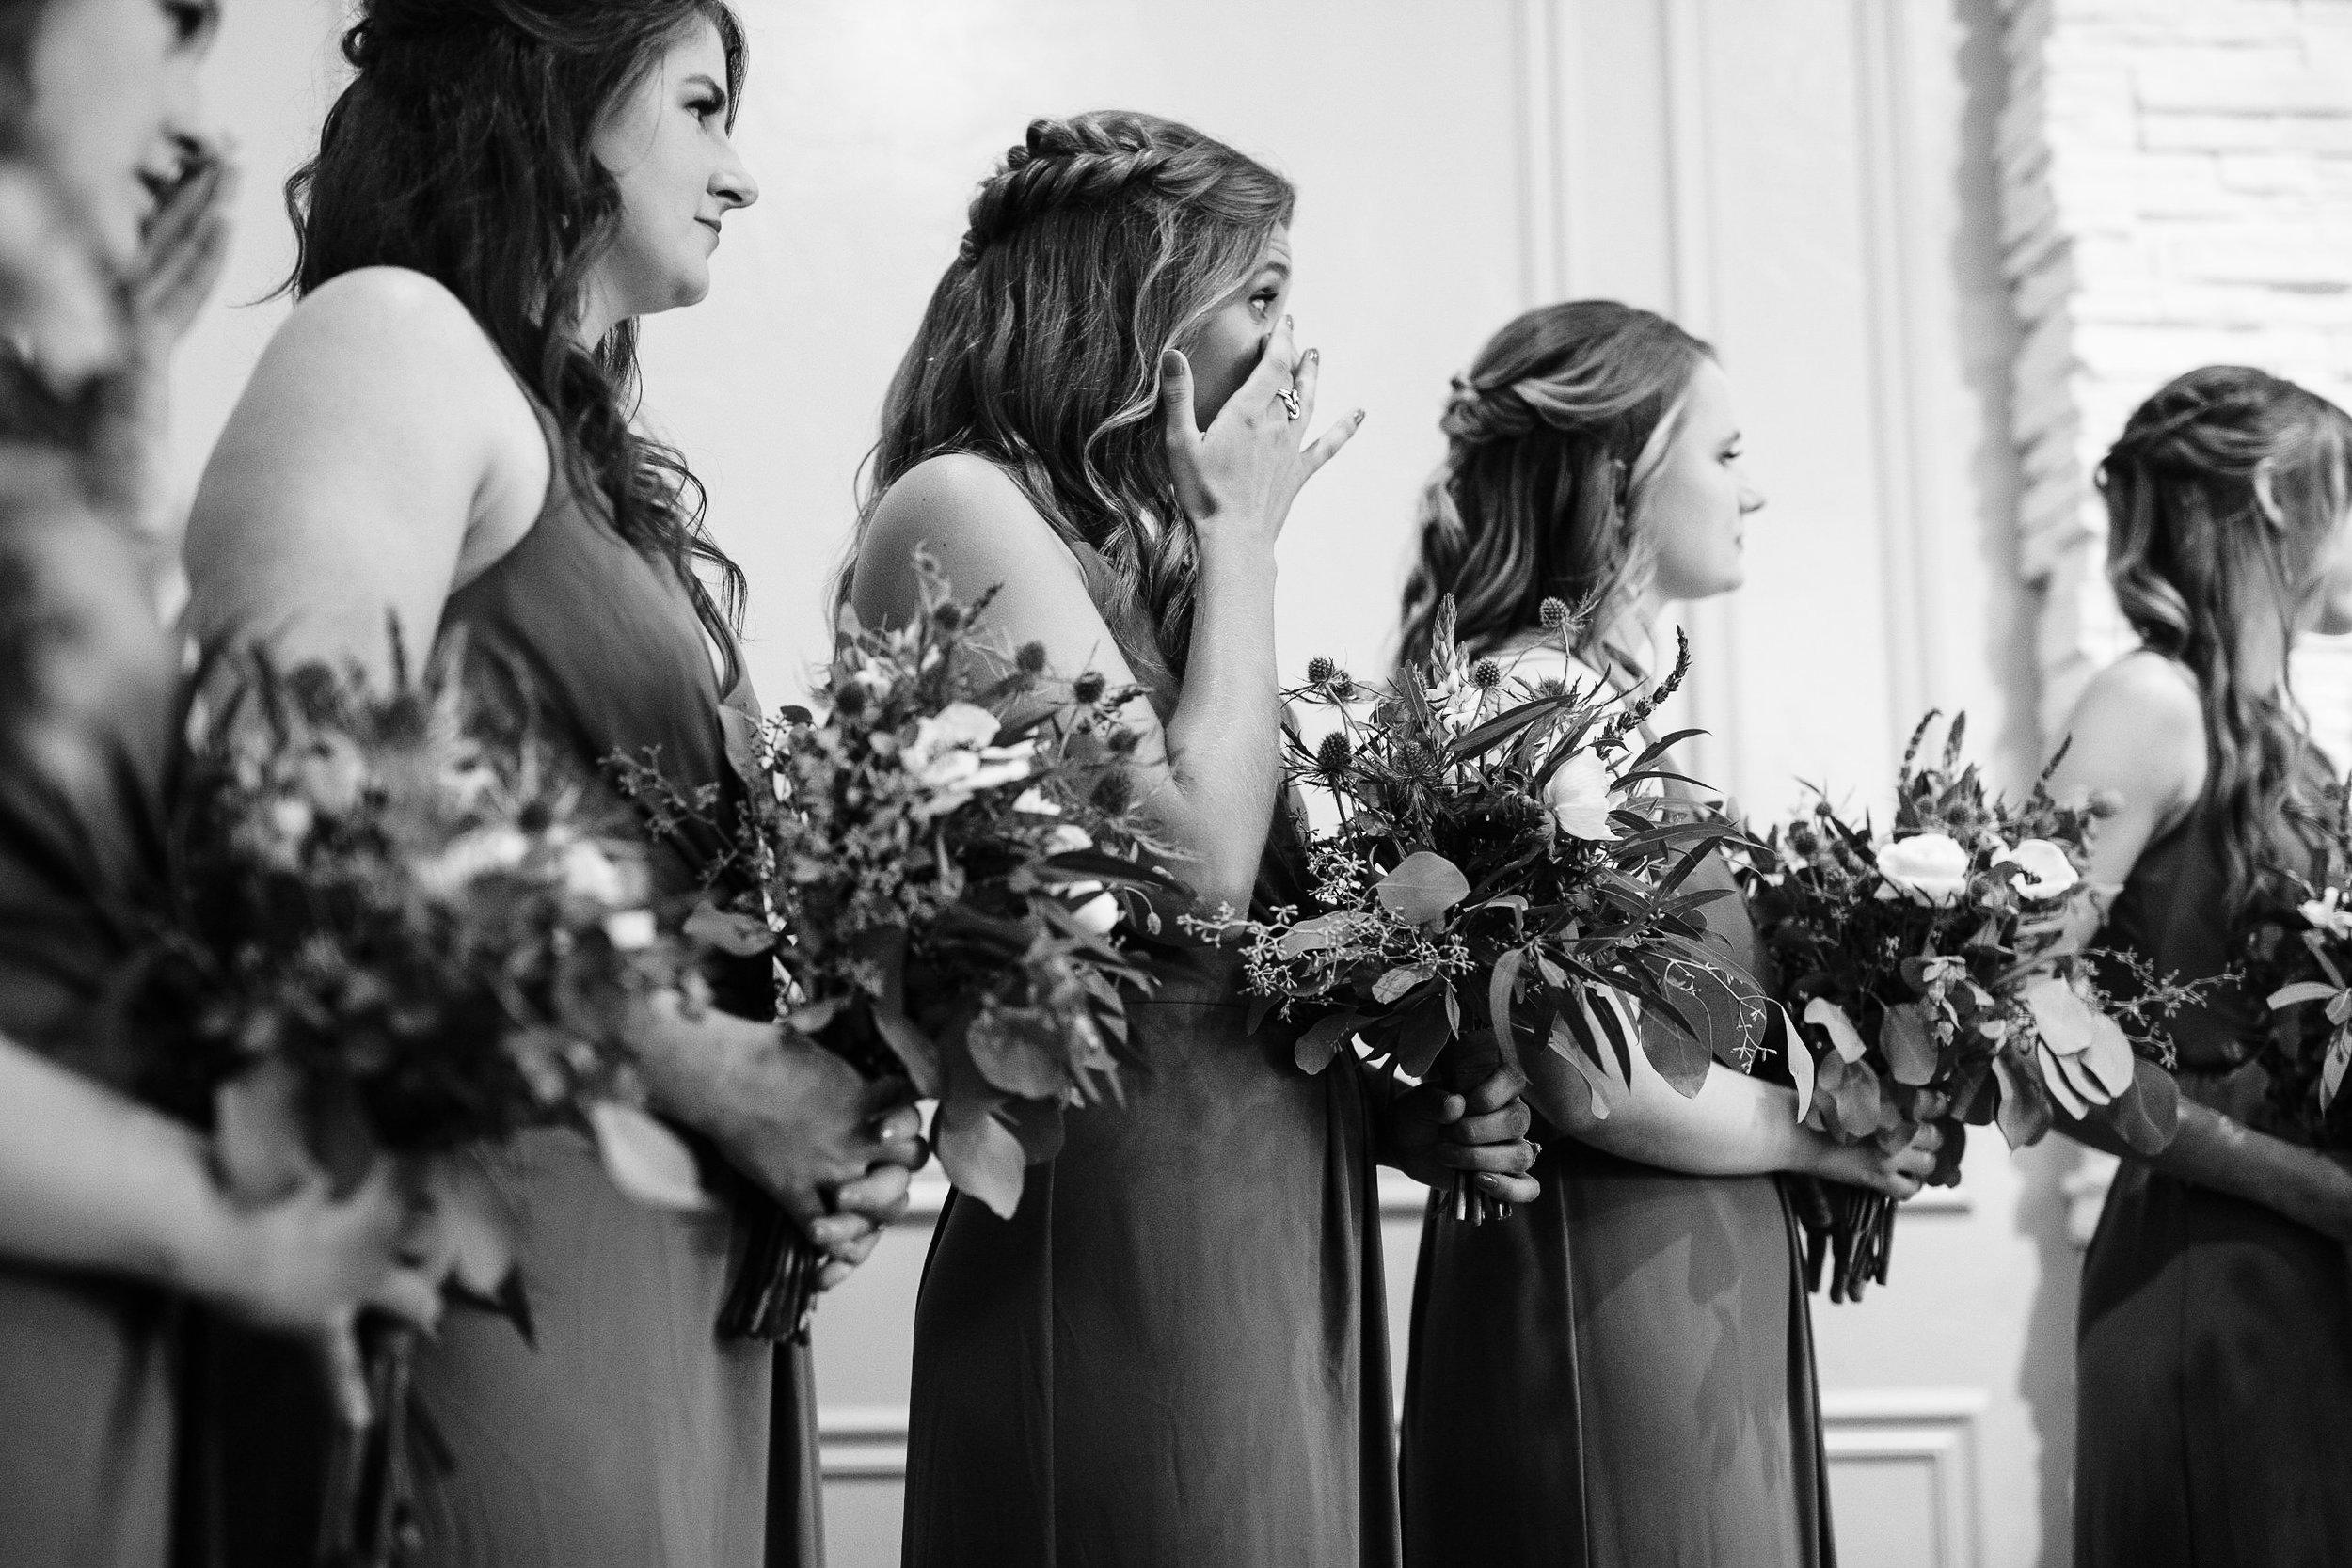 okc-wedding-photographer-coles-garden-wedding-okc-best-wedding-photographers-117.jpg